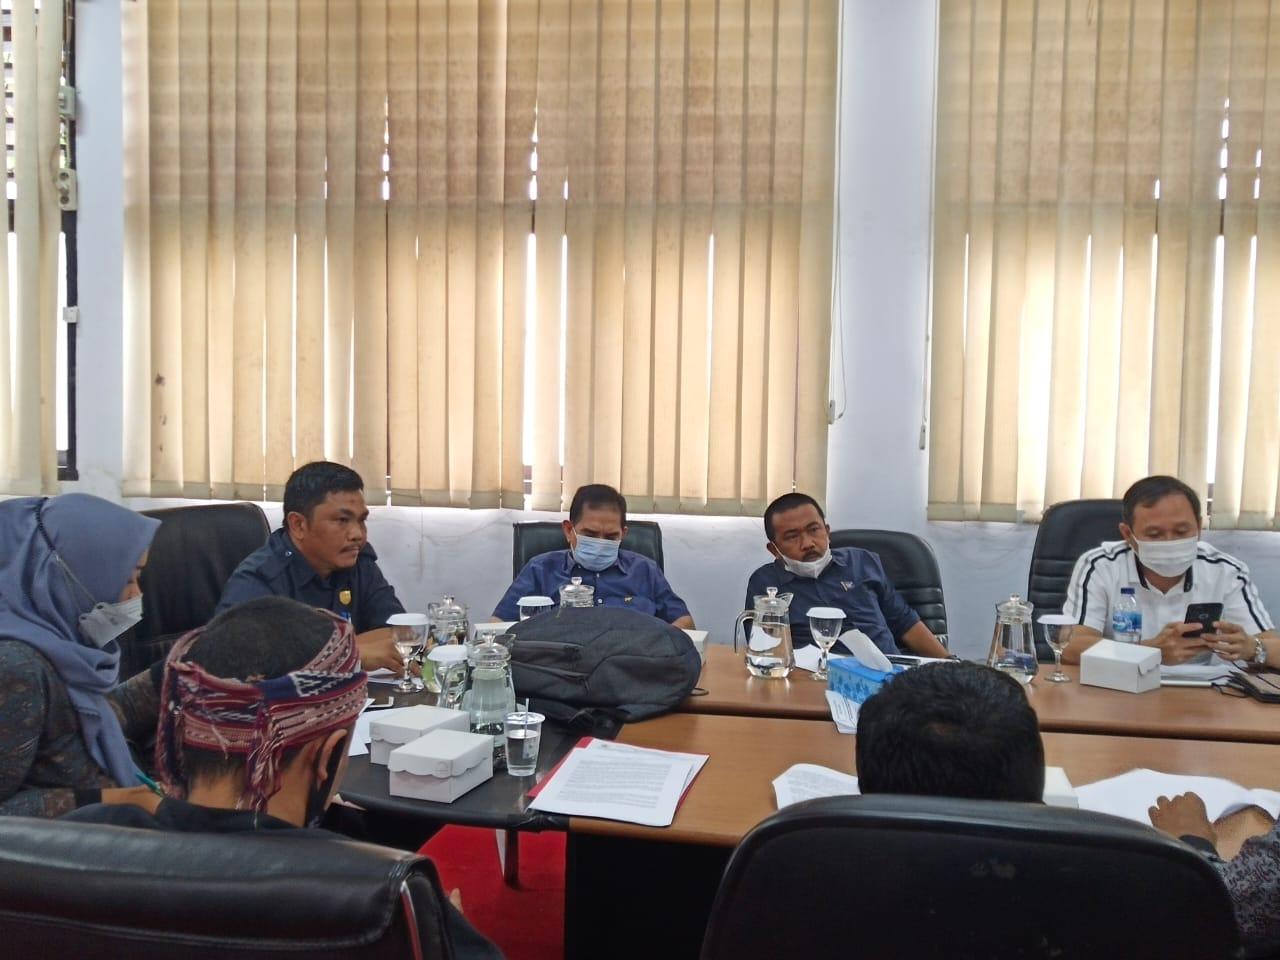 Suasana pertemuan DPRD Kotamobagu dan PS2BMR terkait pembahasan Ranperda inisiatif DPRD terkait HUT Kotamobagu. (foto; Theza Gobel)